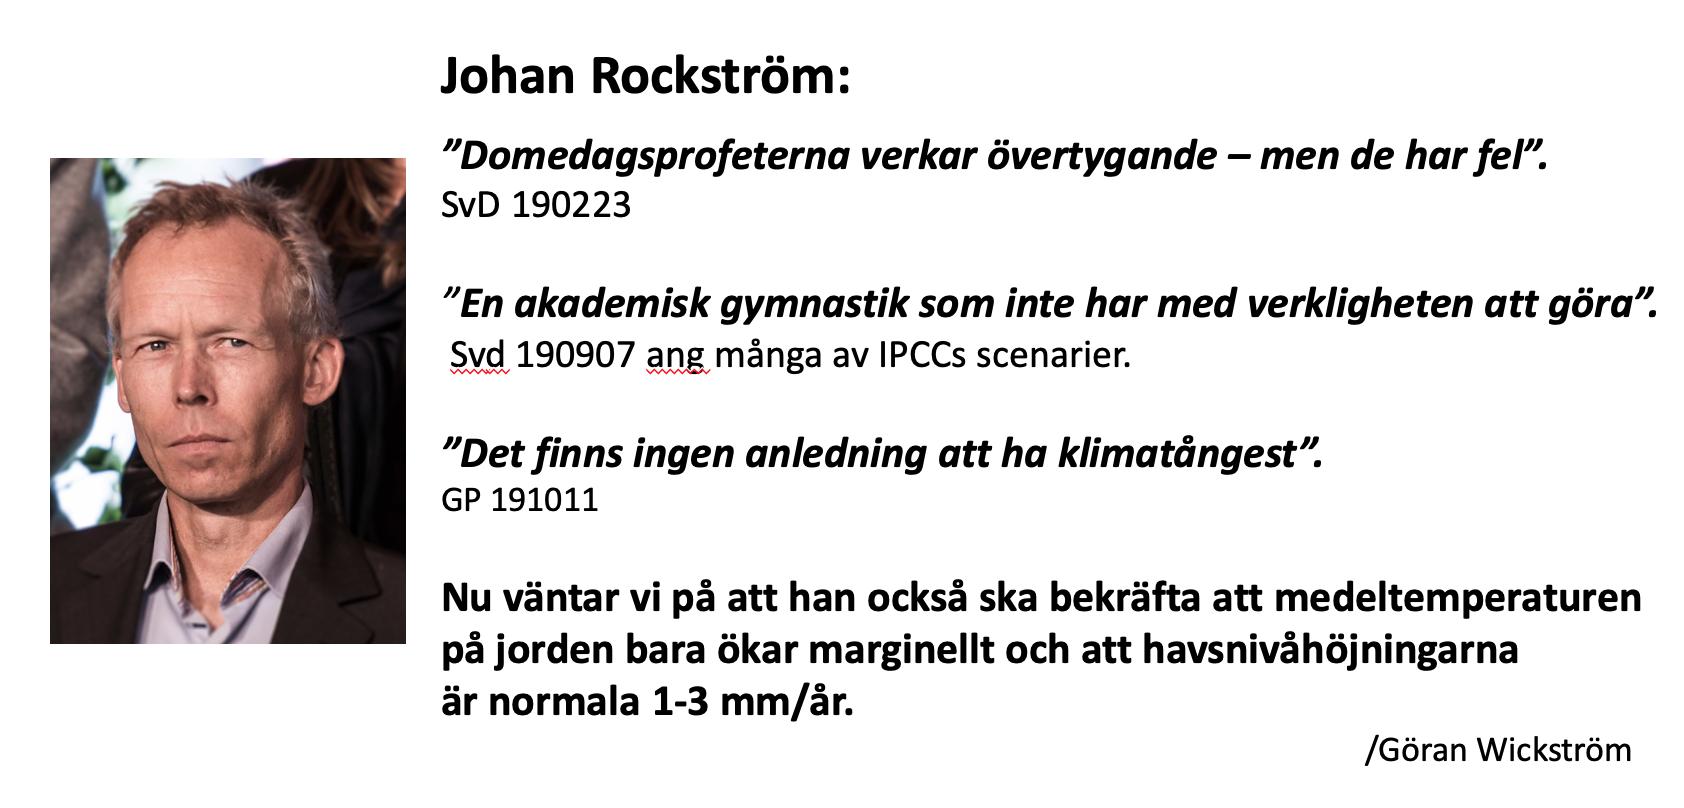 Johan Rockström citat